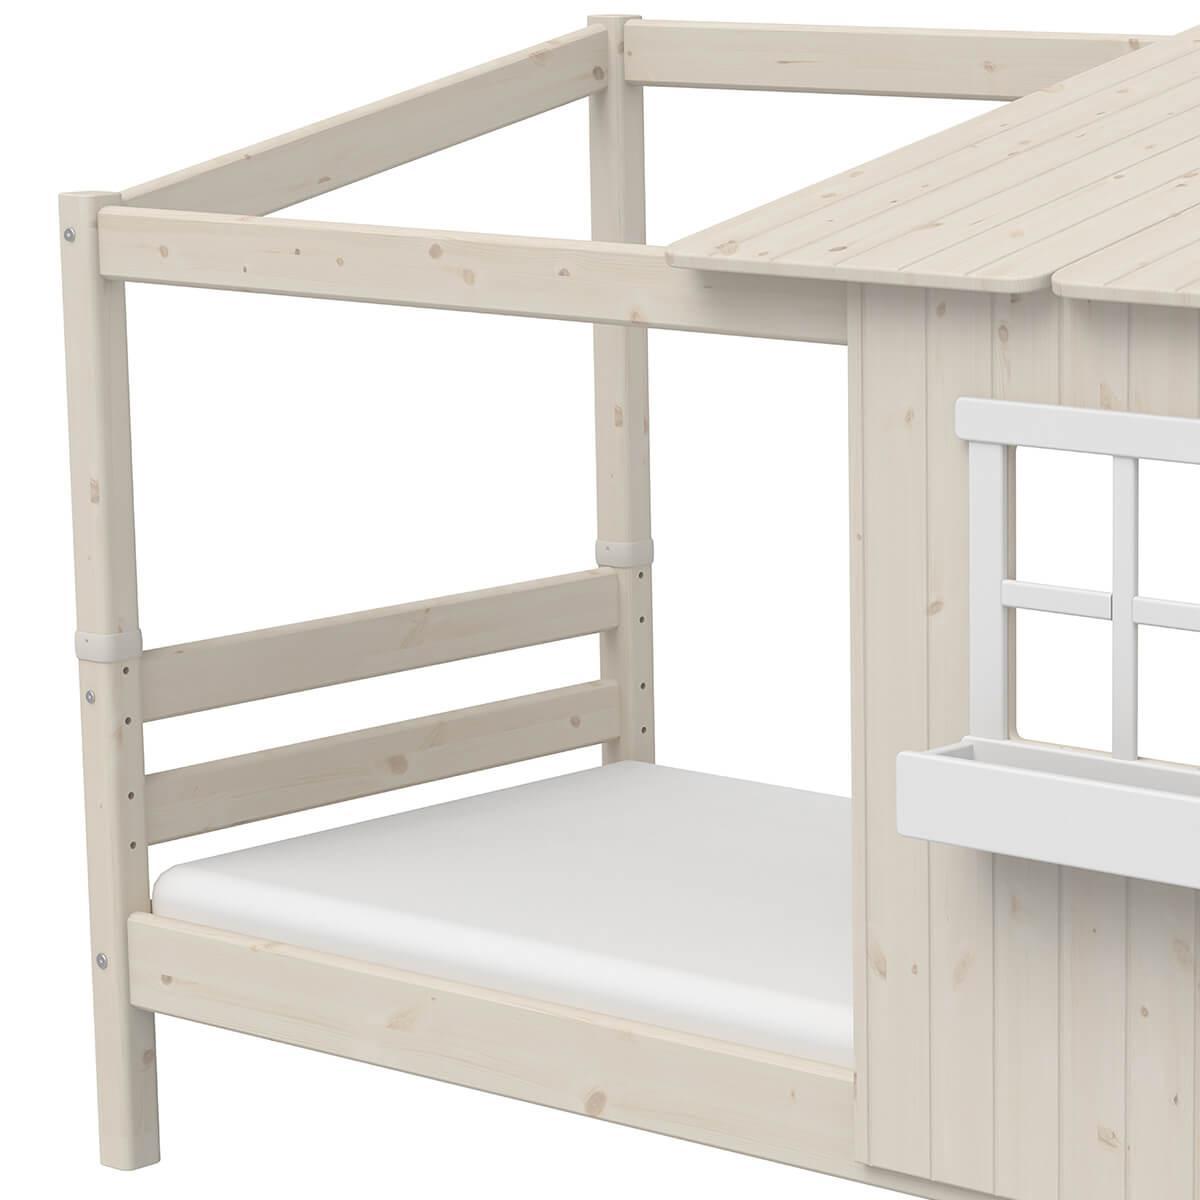 Cama individual evolutiva cabaña 90x200cm 1/2 PLAY HOUSE CLASSIC Flexa blanco cal-blanco